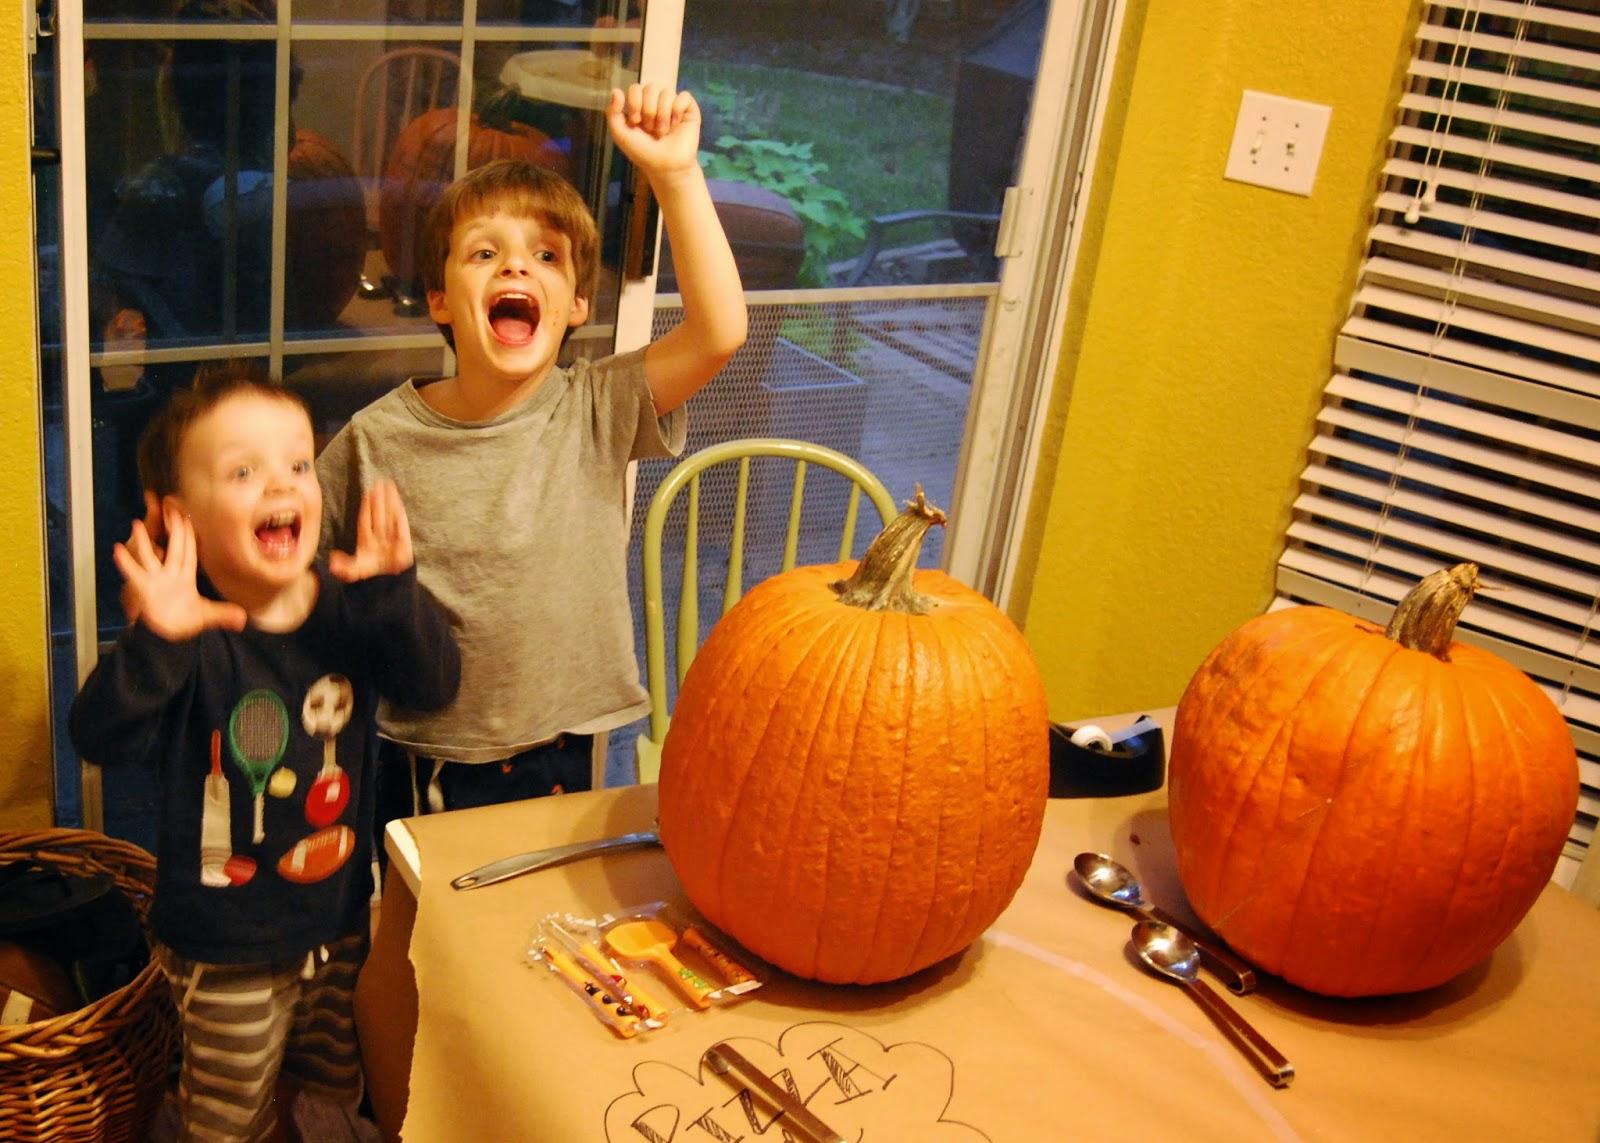 Momfessionals: Pizza and Pumpkins